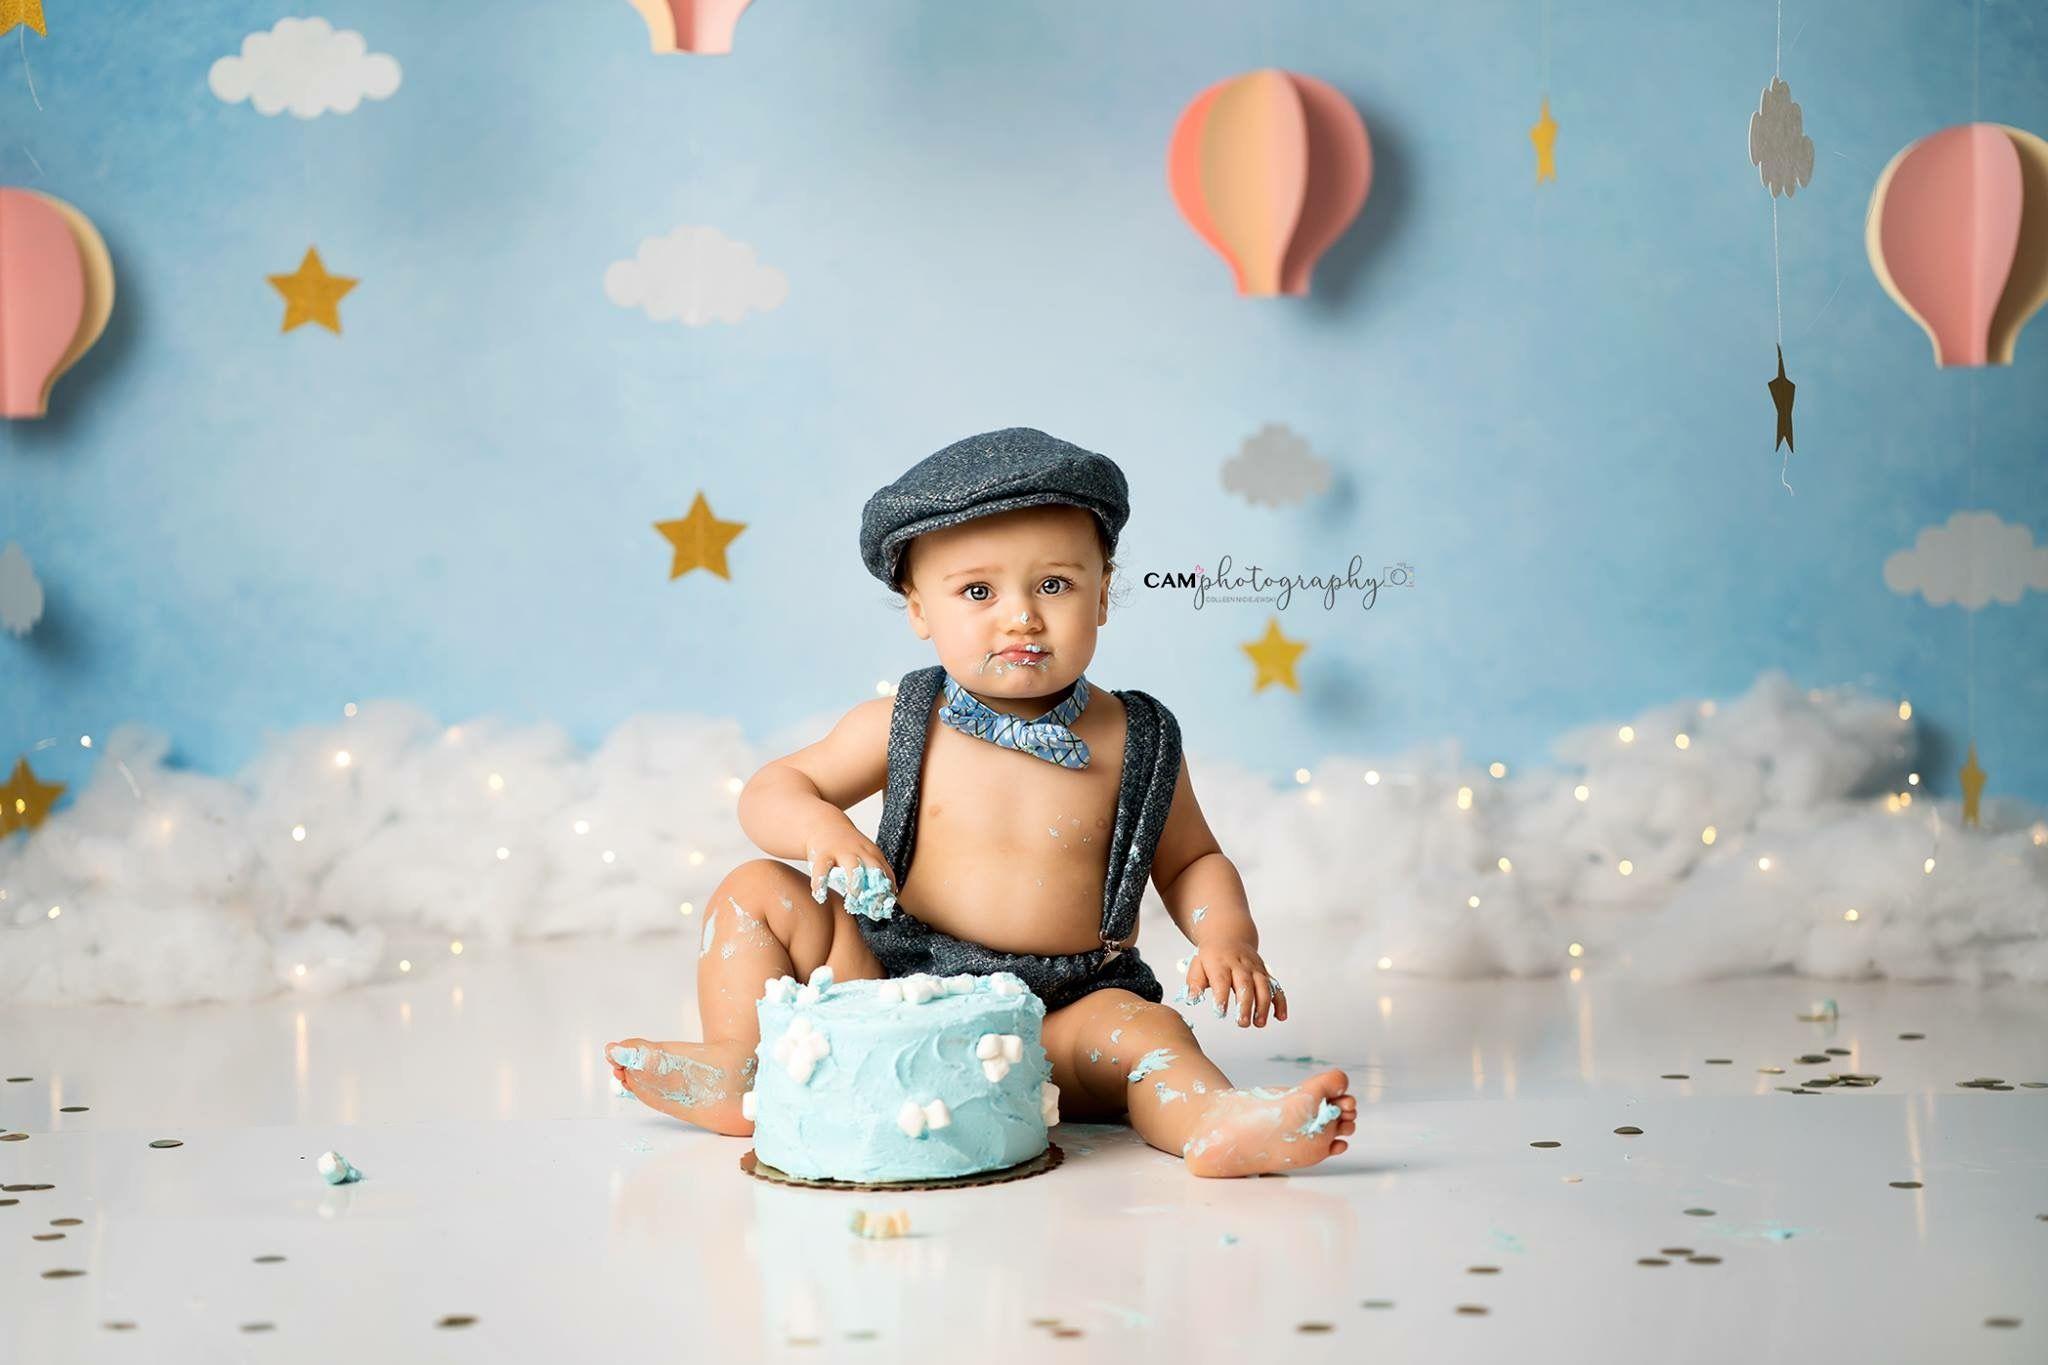 Boy Cake Smash Photography Up Up And Away Cake Smash Balloon